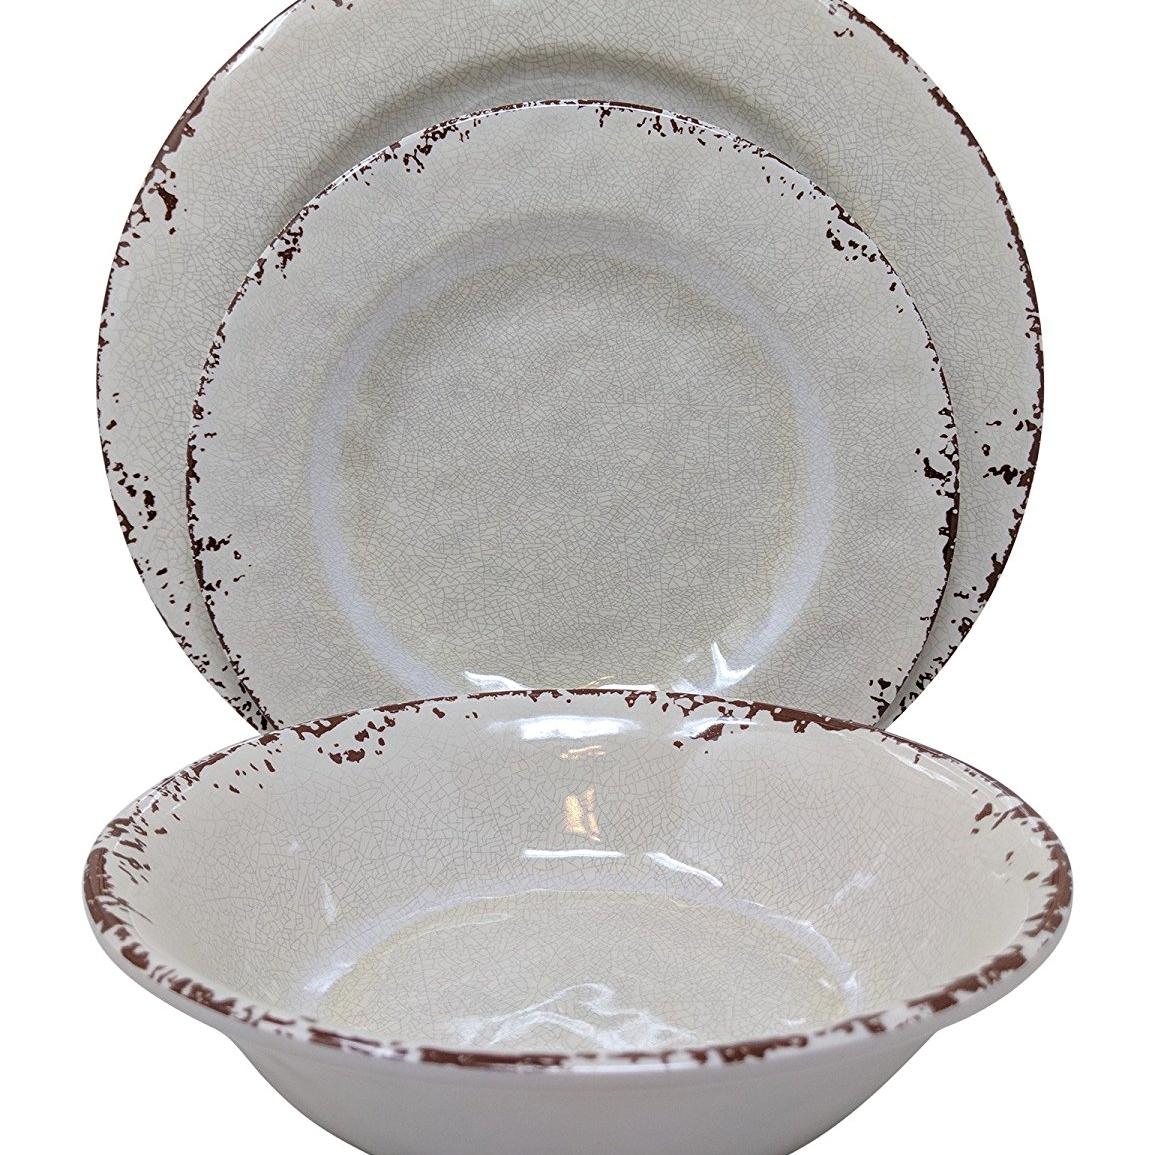 Rustic Melamine Dishware